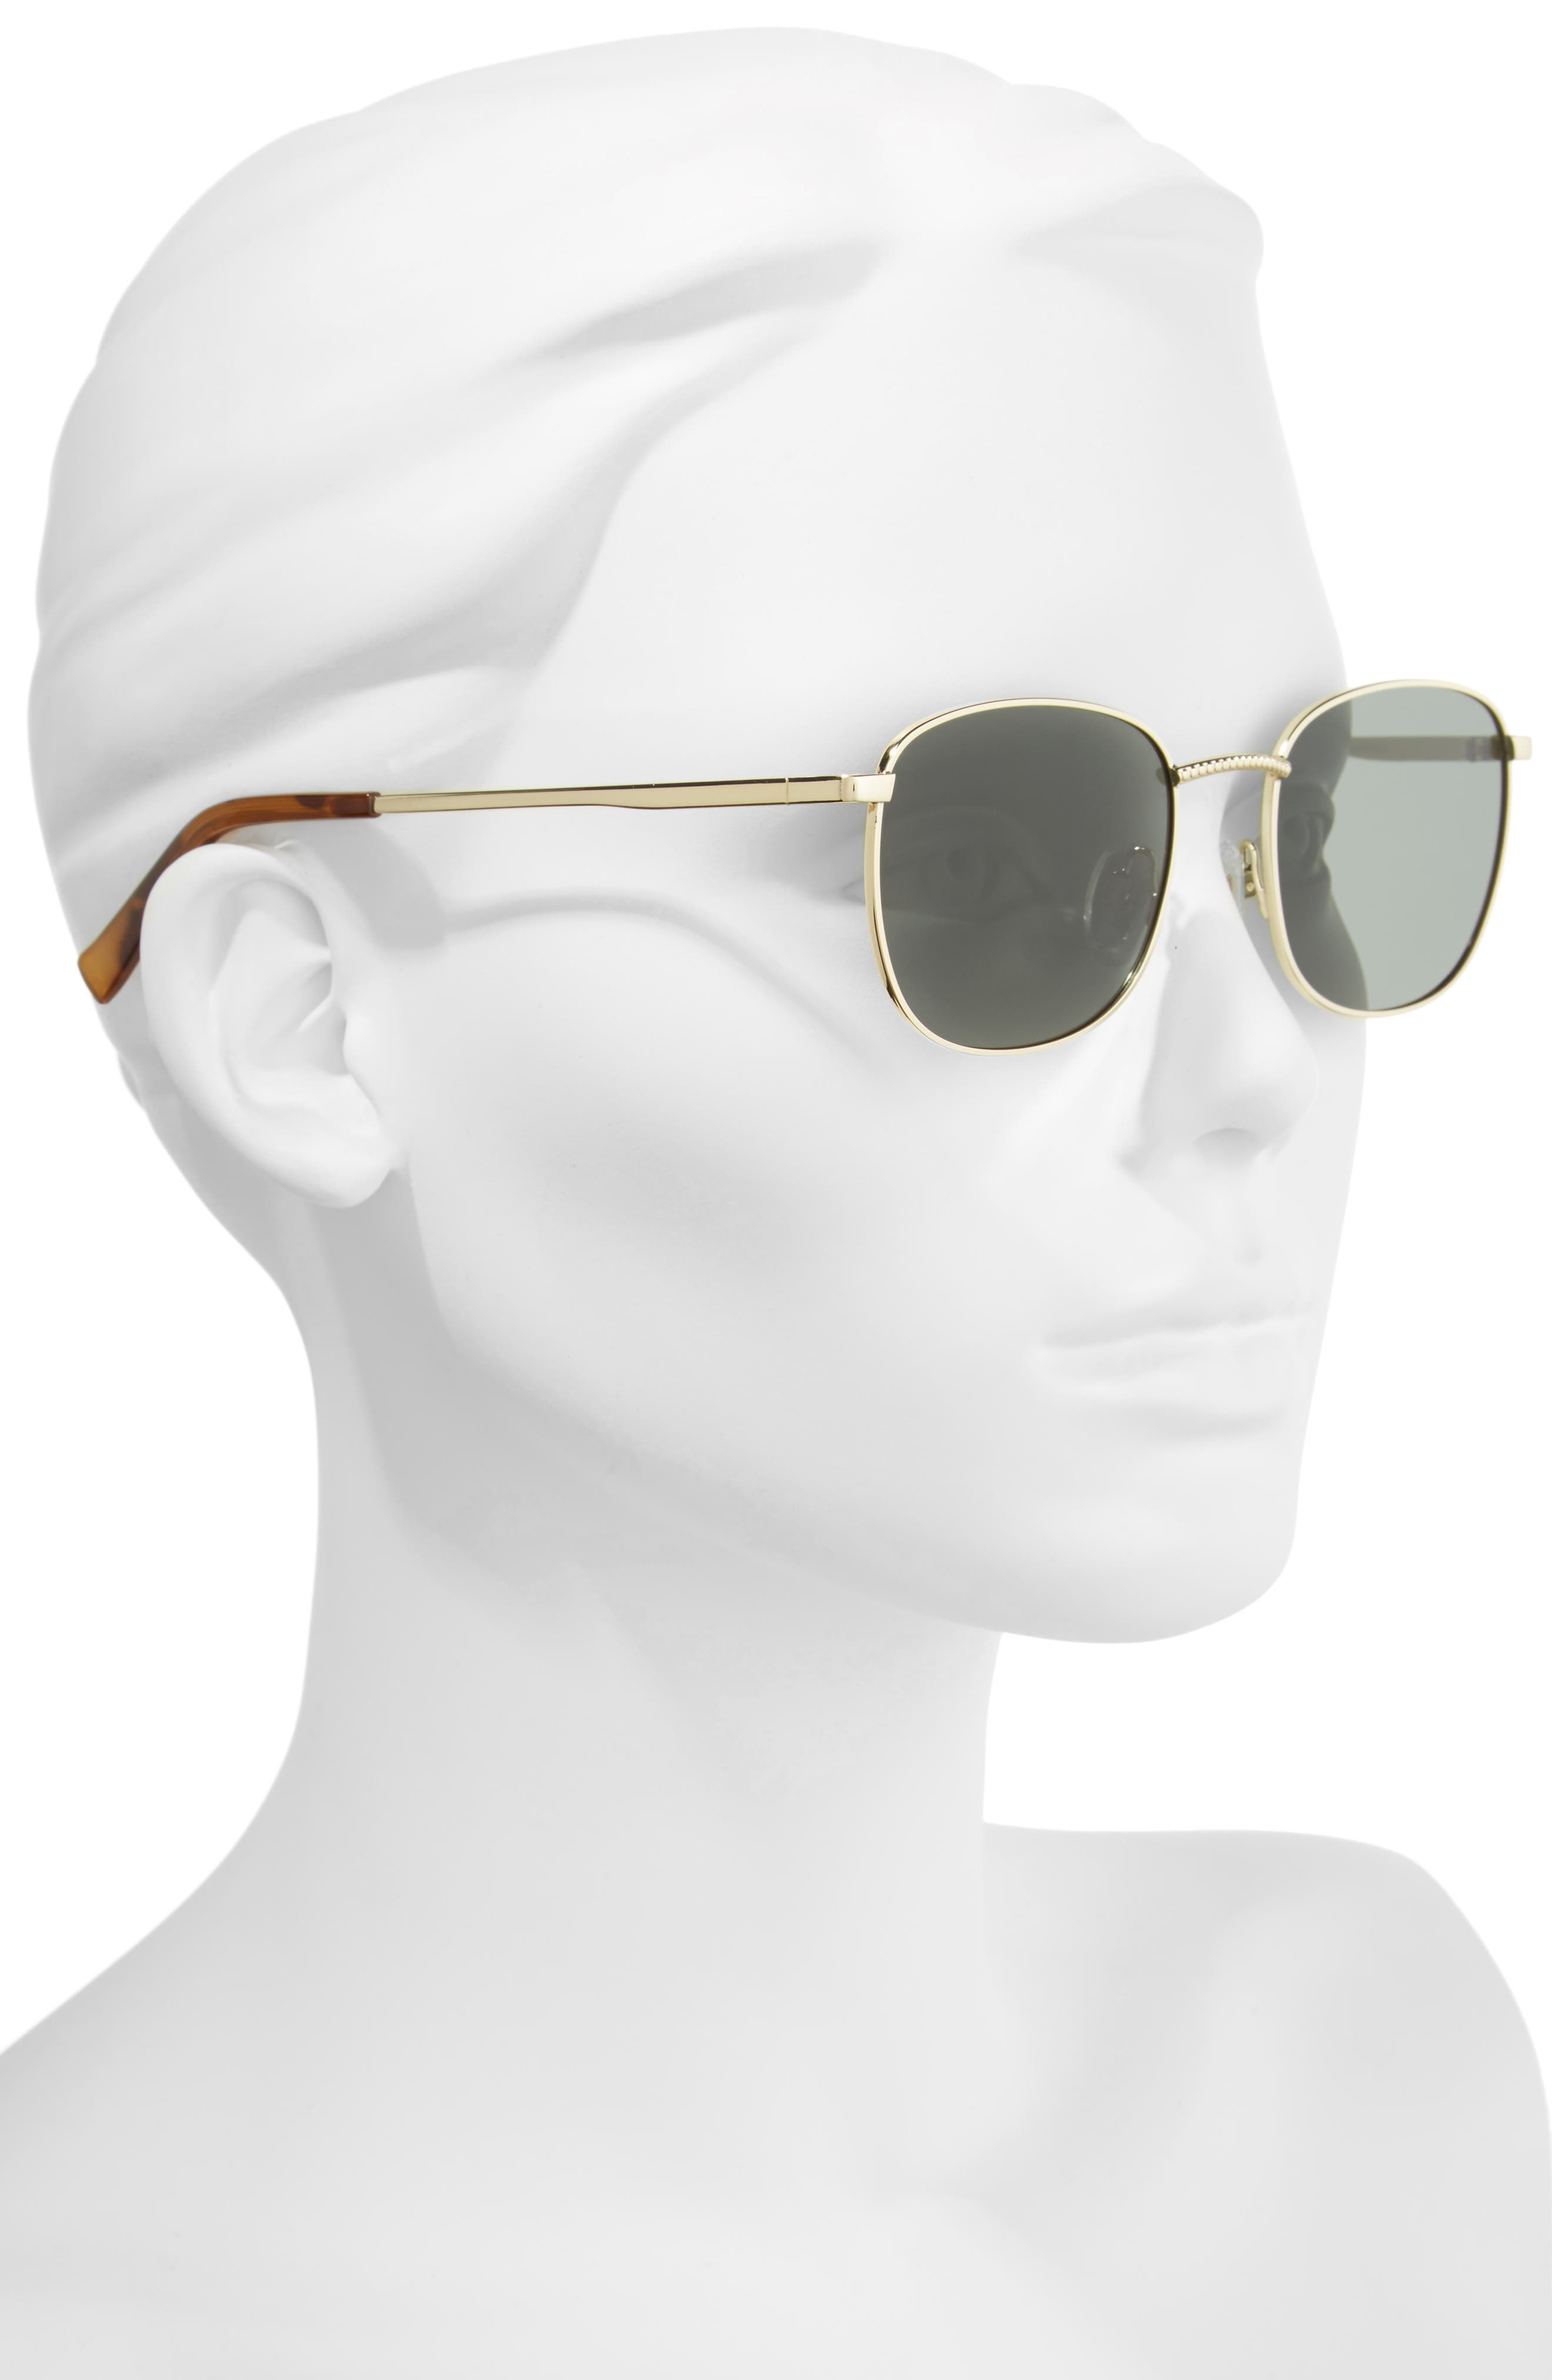 Neptune 49mm Sunglasses,                             Alternate thumbnail 2, color,                             BRIGHT GOLD